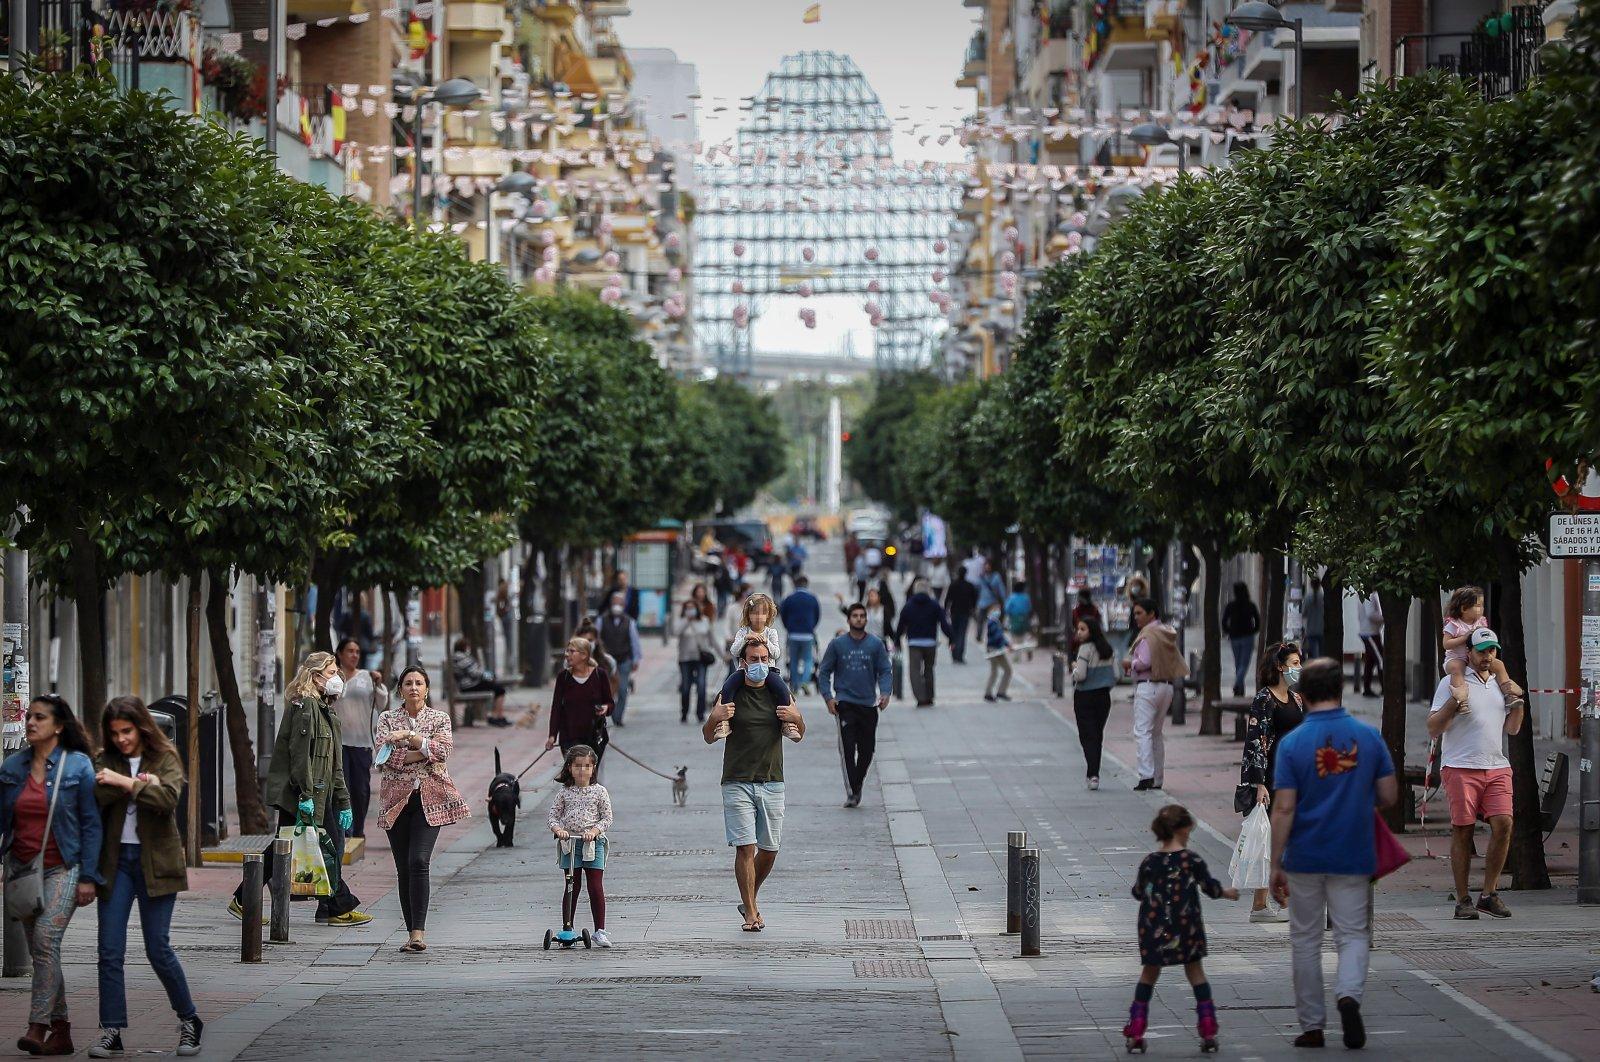 People walk down Callo San Jacinto, in Sevilla, Spain, April 26, 2020. (EPA Photo)